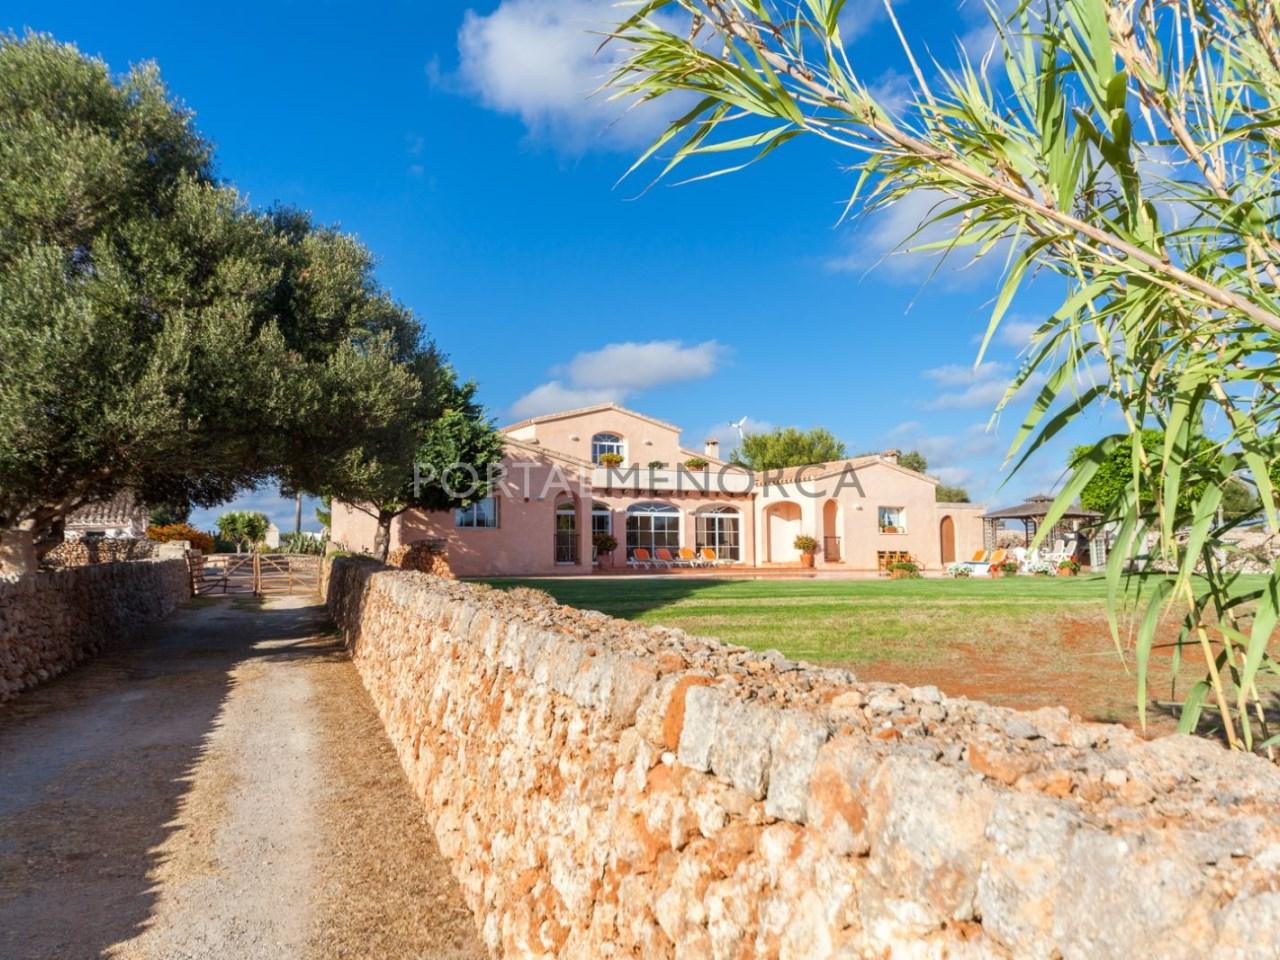 Casa de campo con piscina en Menorca (27 de 41)